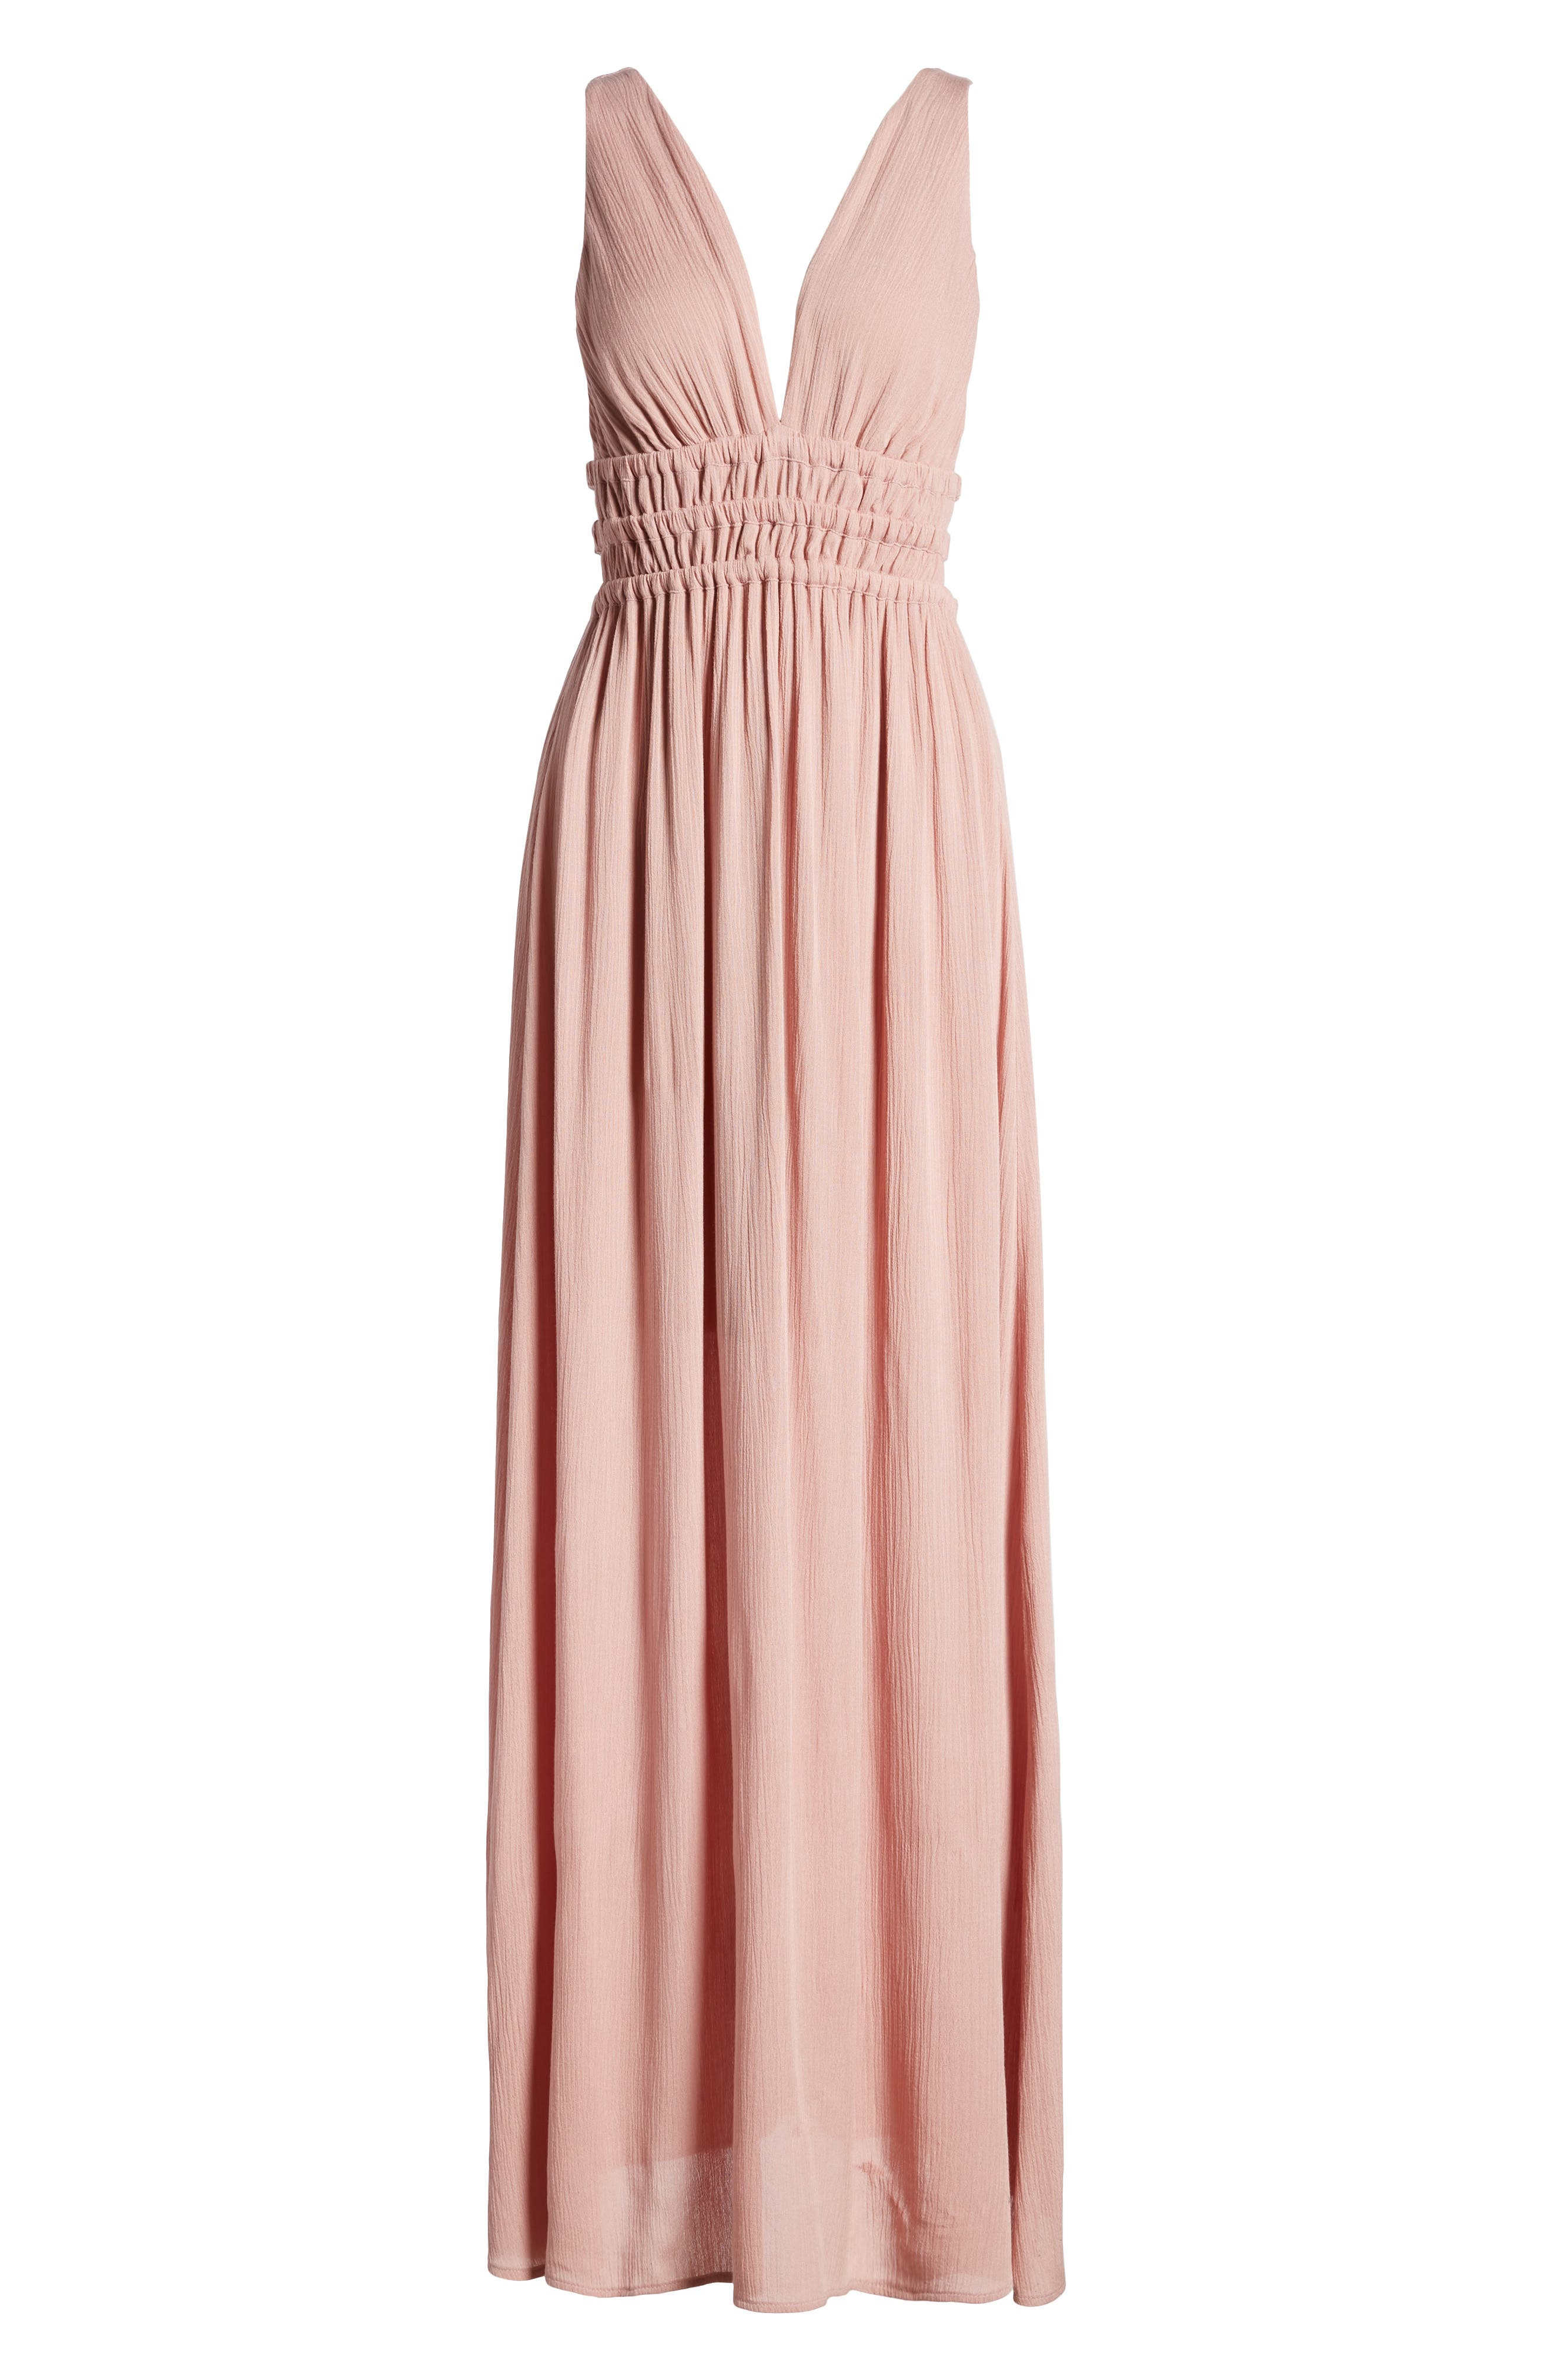 Surrey Maxi Dress,                             Alternate thumbnail 7, color,                             Nude Rose